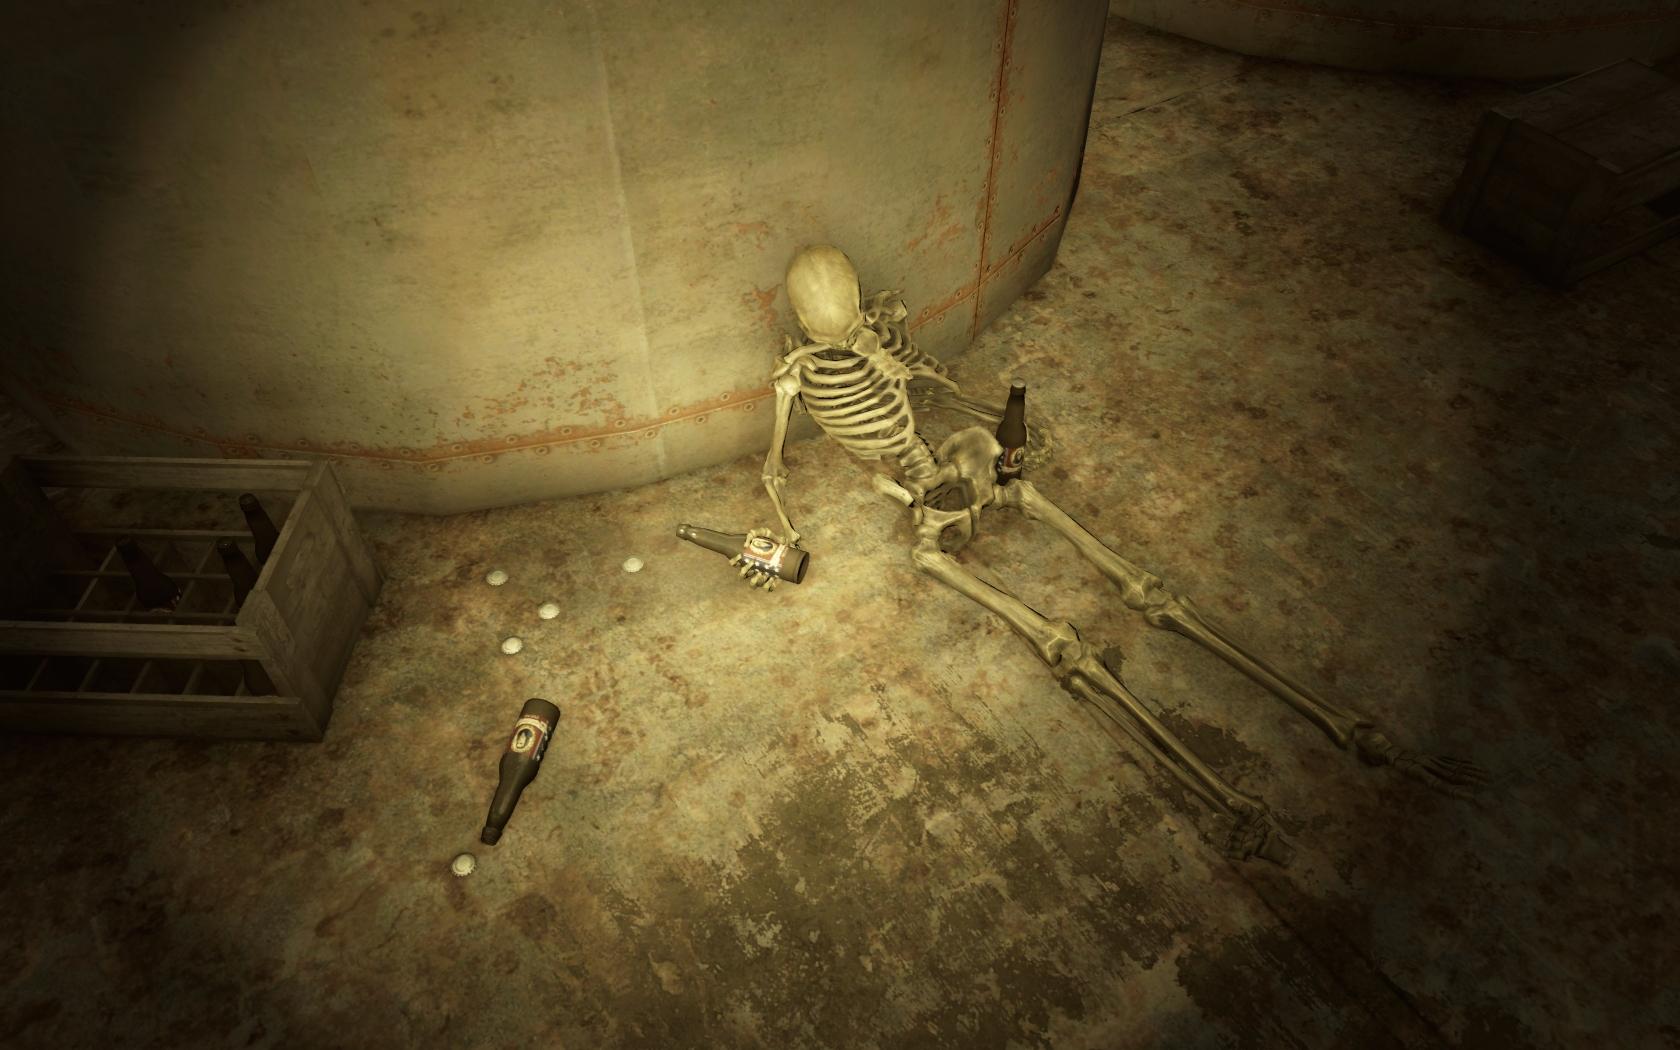 Обоерукий выпивоха (Пивоварня Бинтаун) - Fallout 4 скелет, Юмор